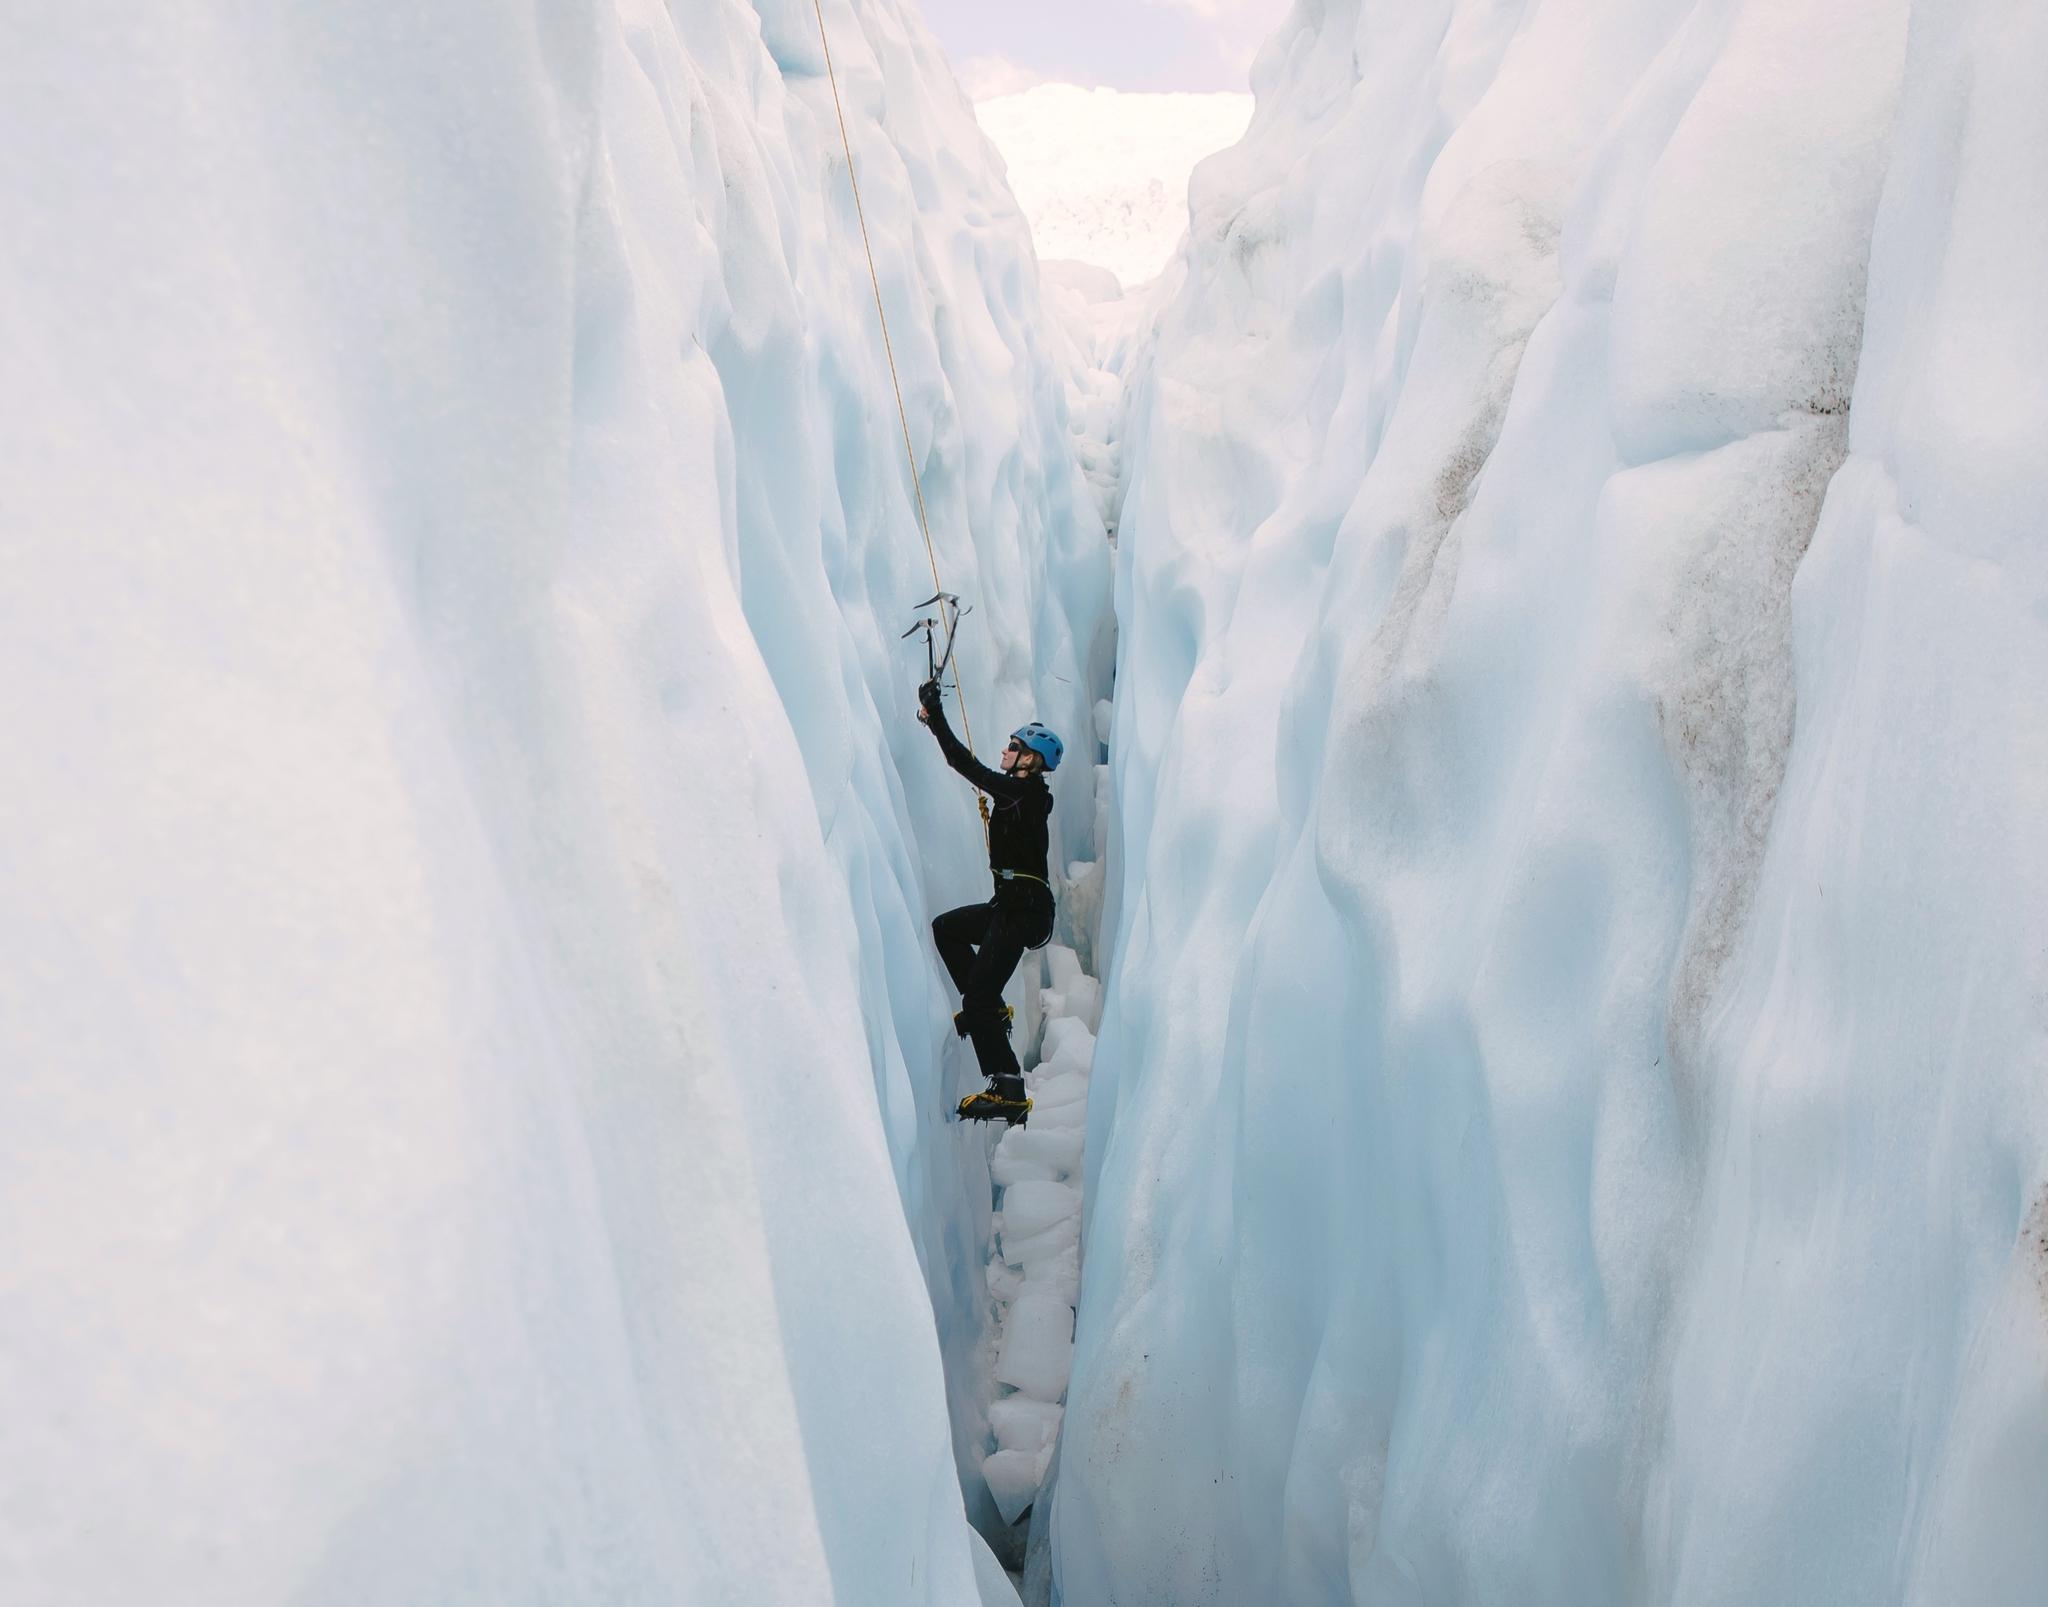 Tasman Glacier Ice Climbing 攀冰